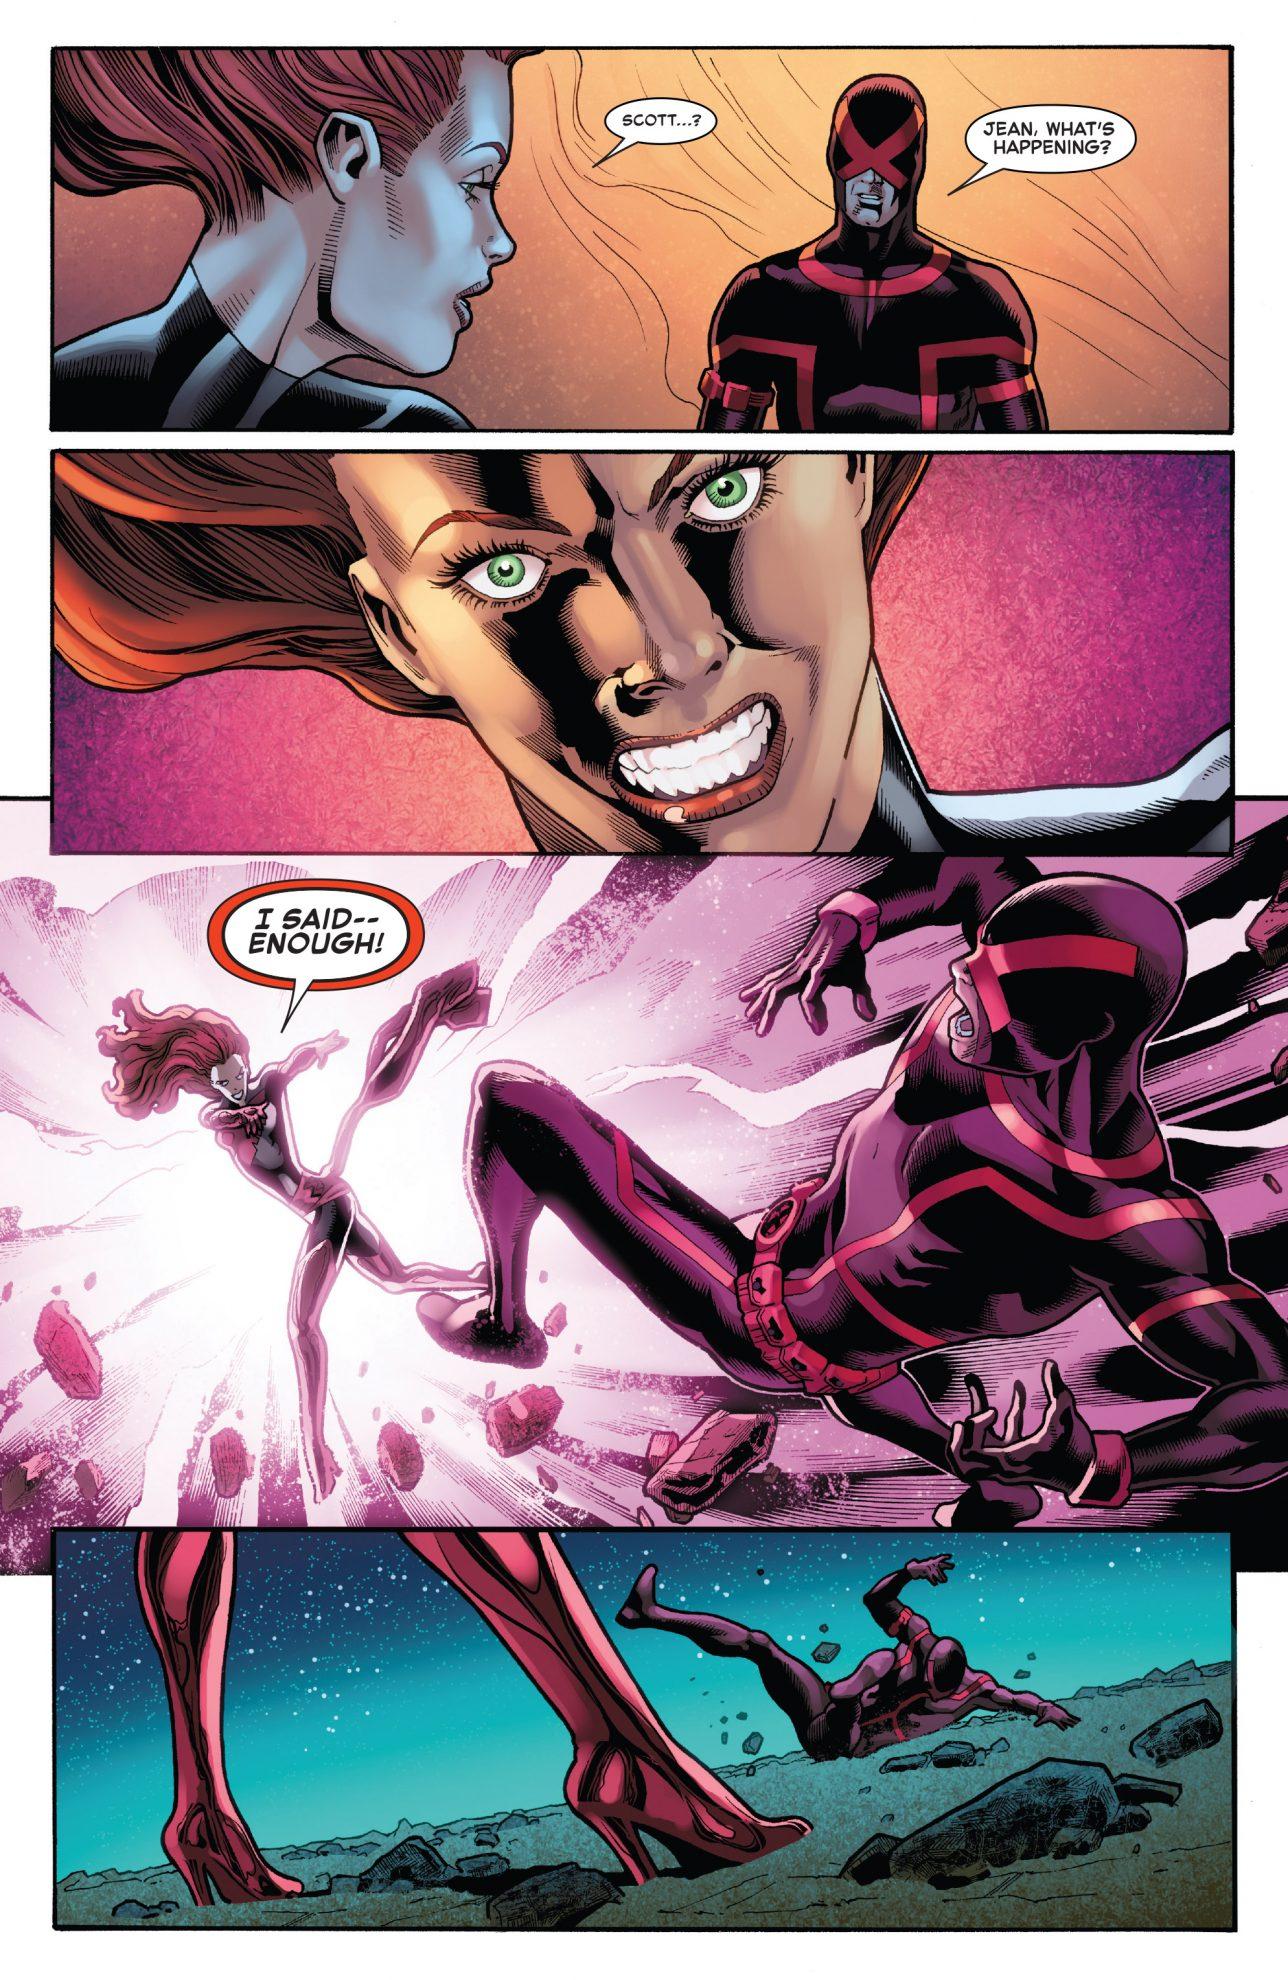 Cyclops And Jean Grey Reunion (Phoenix Resurrection)